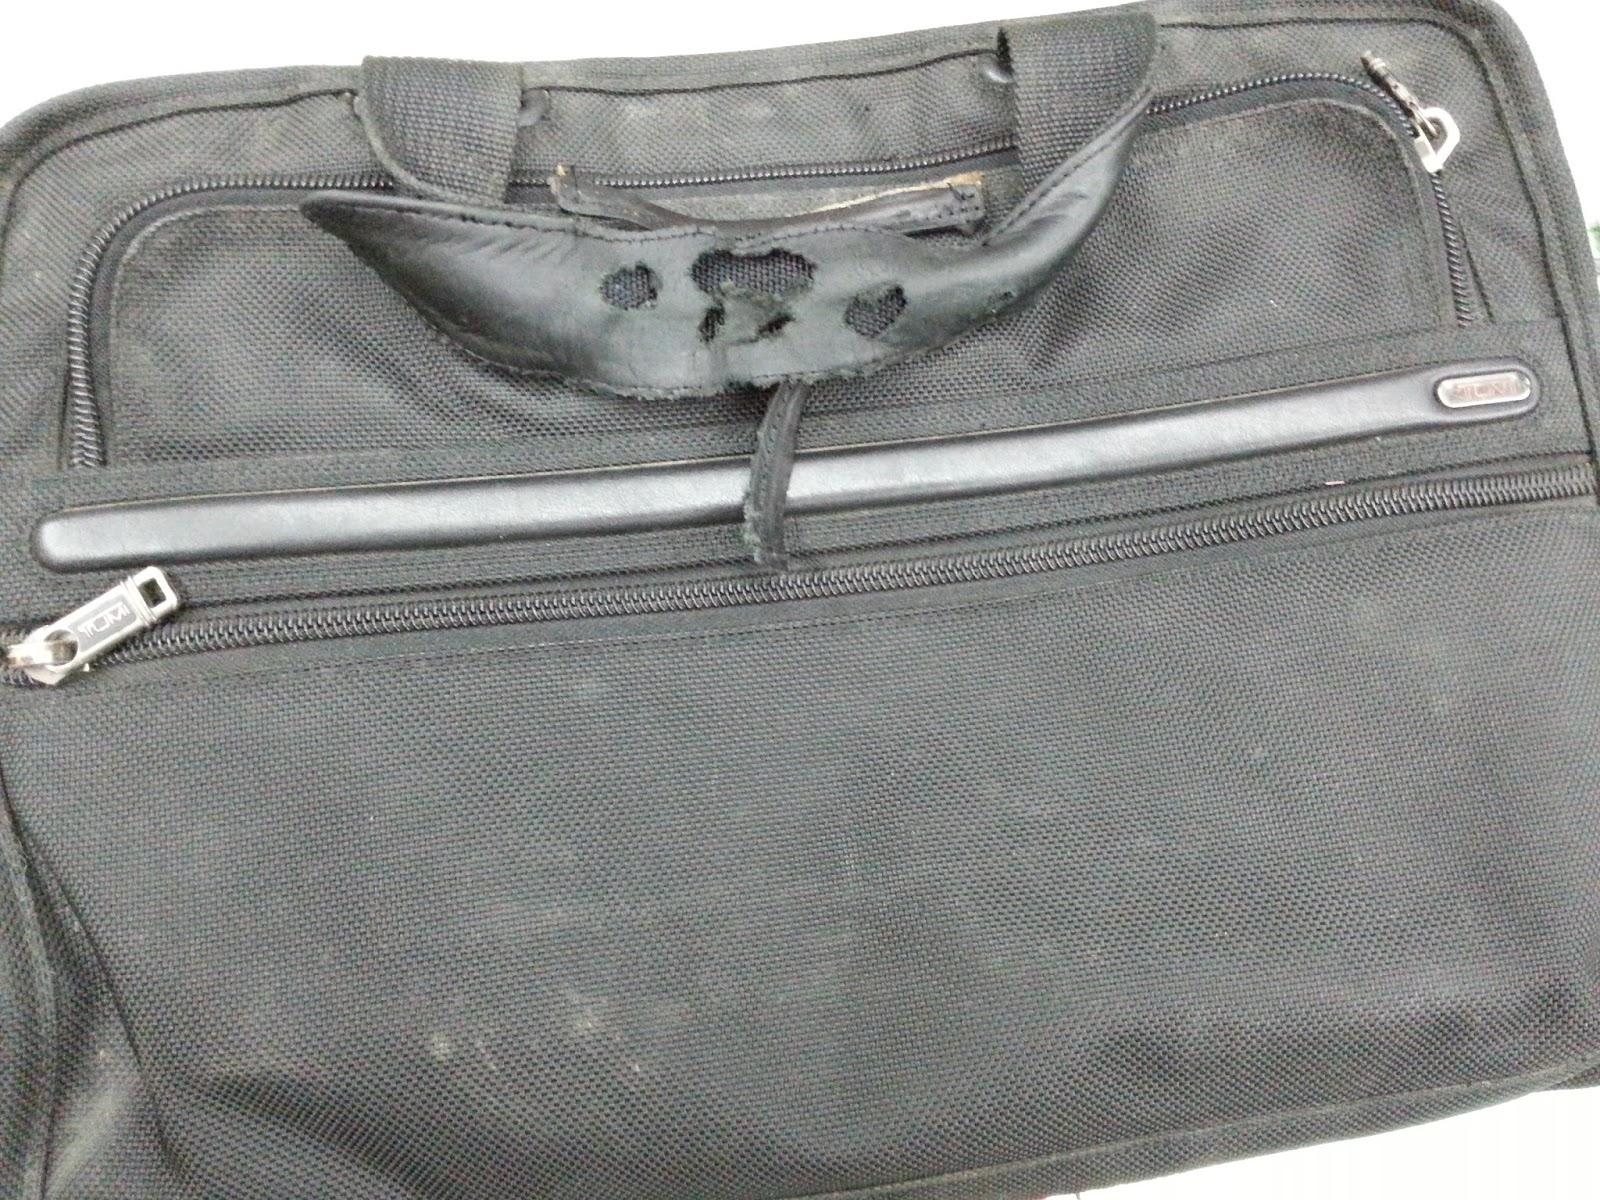 luxury bag repair and restoration service document bags With samsonite document bag